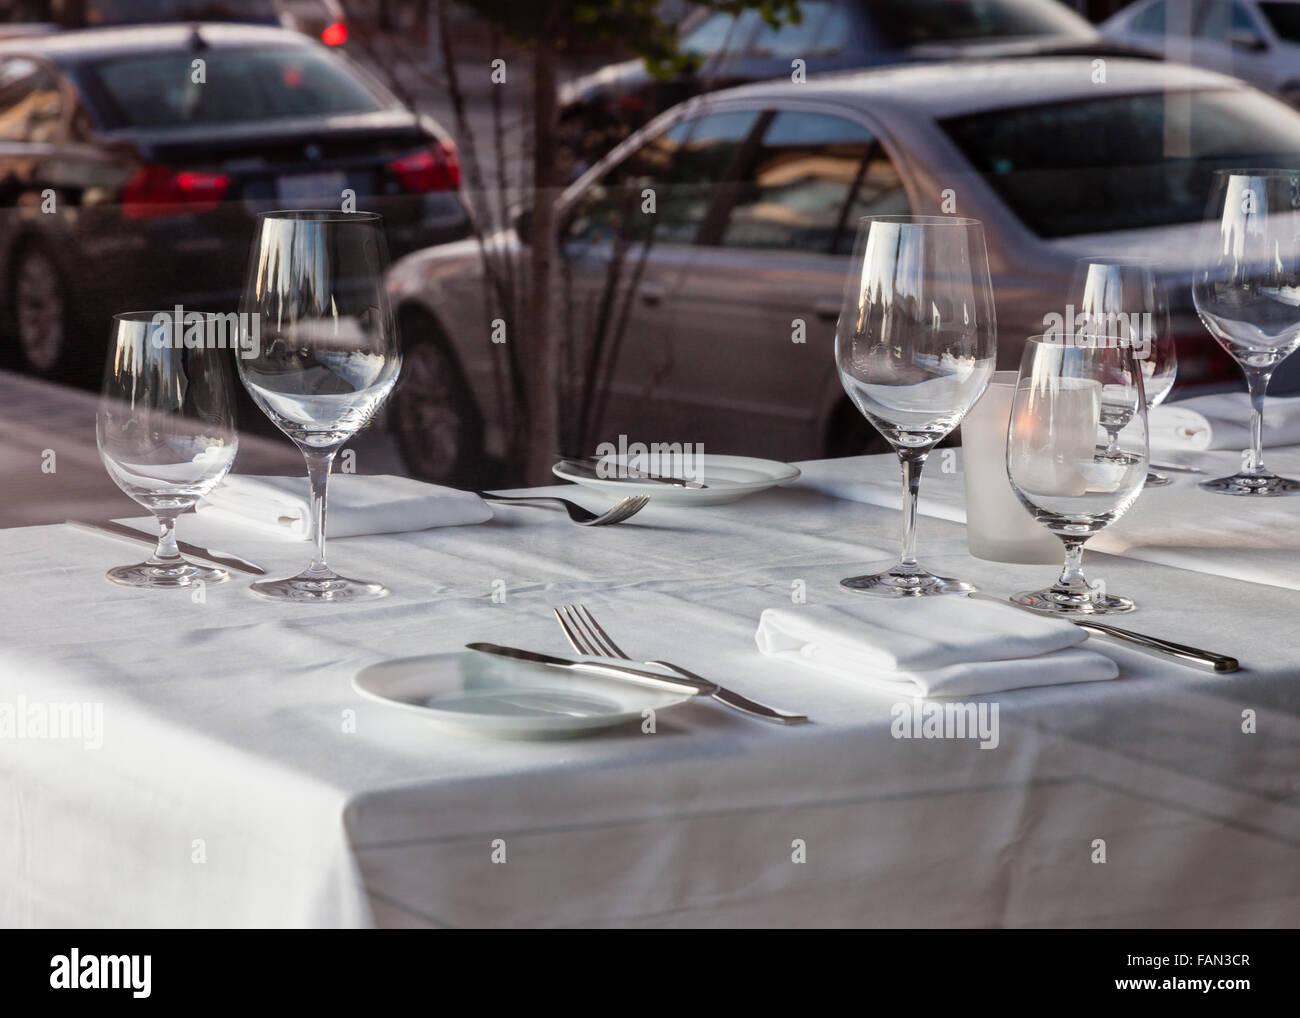 Fine dining restaurant table setup - Fine Dining Table Setting In A Restaurant With White Tablecloth Napkins And Wine Glasses